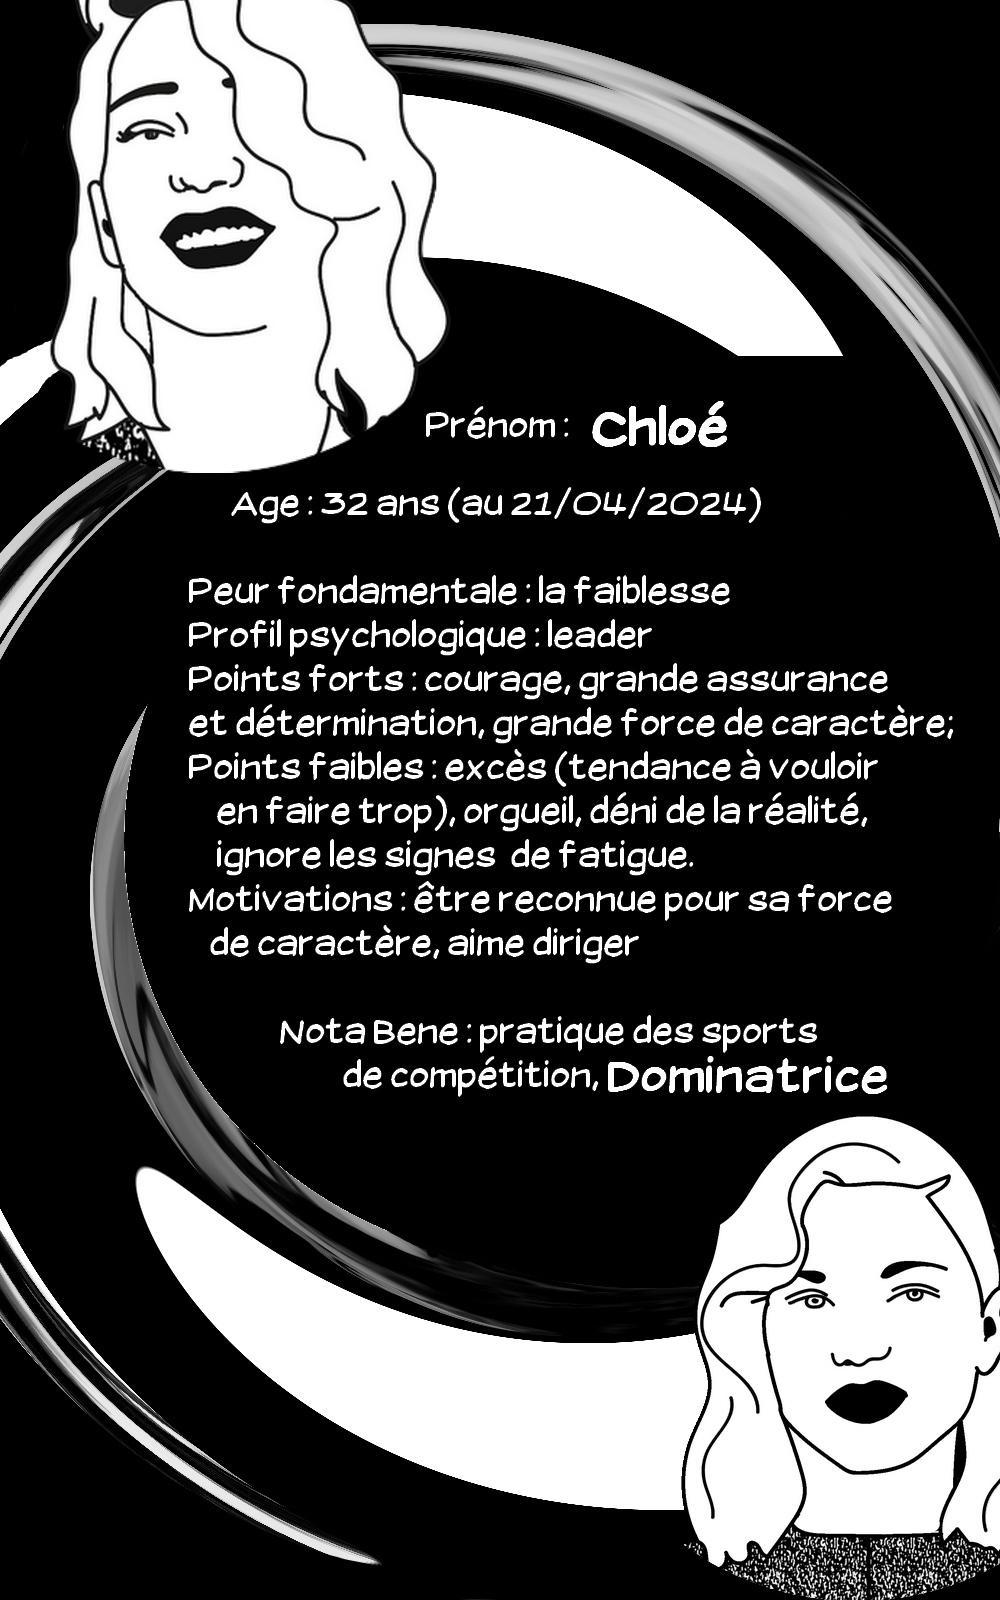 Fiche chloe 2